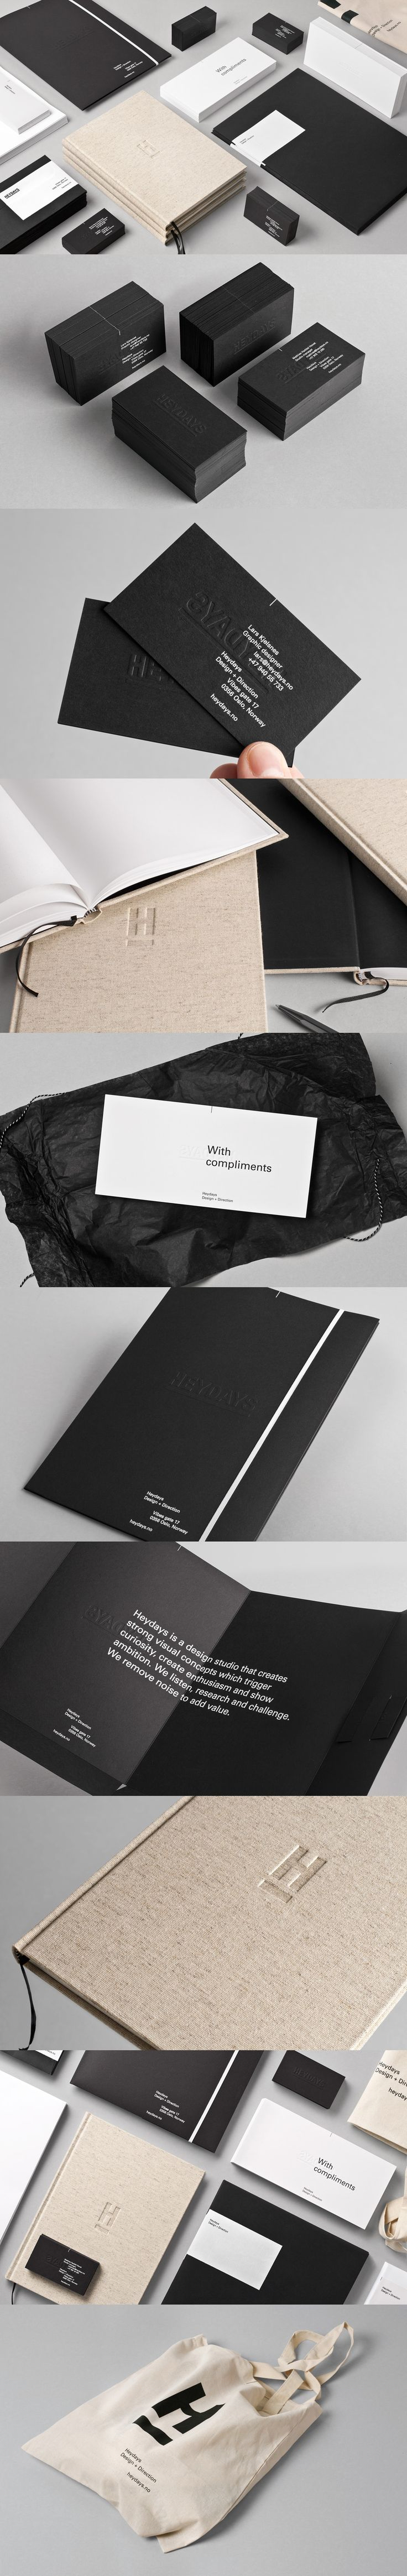 """Heydays branding  design identity"""